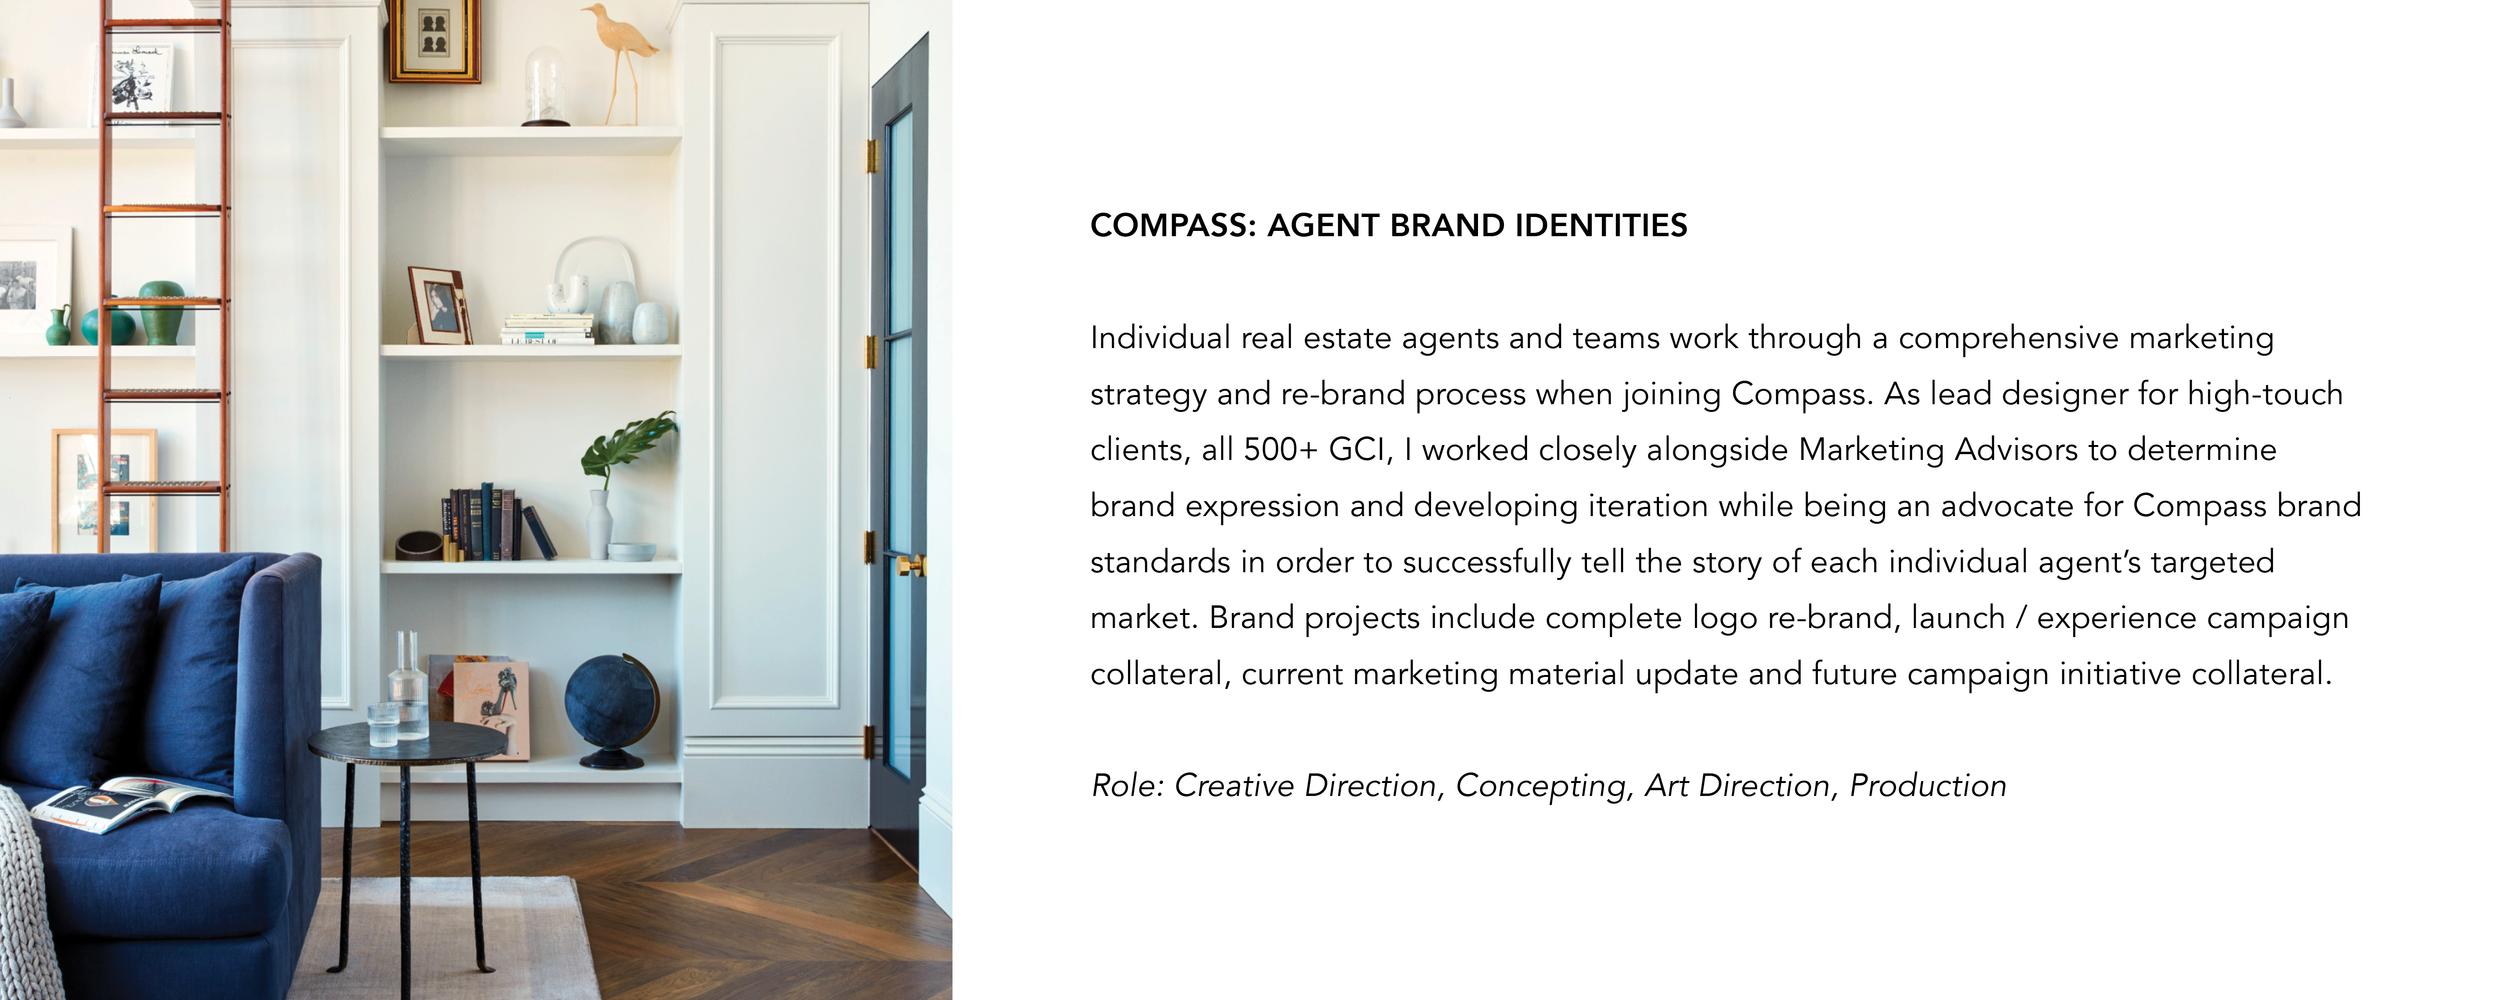 Compass-Logos_Description.png